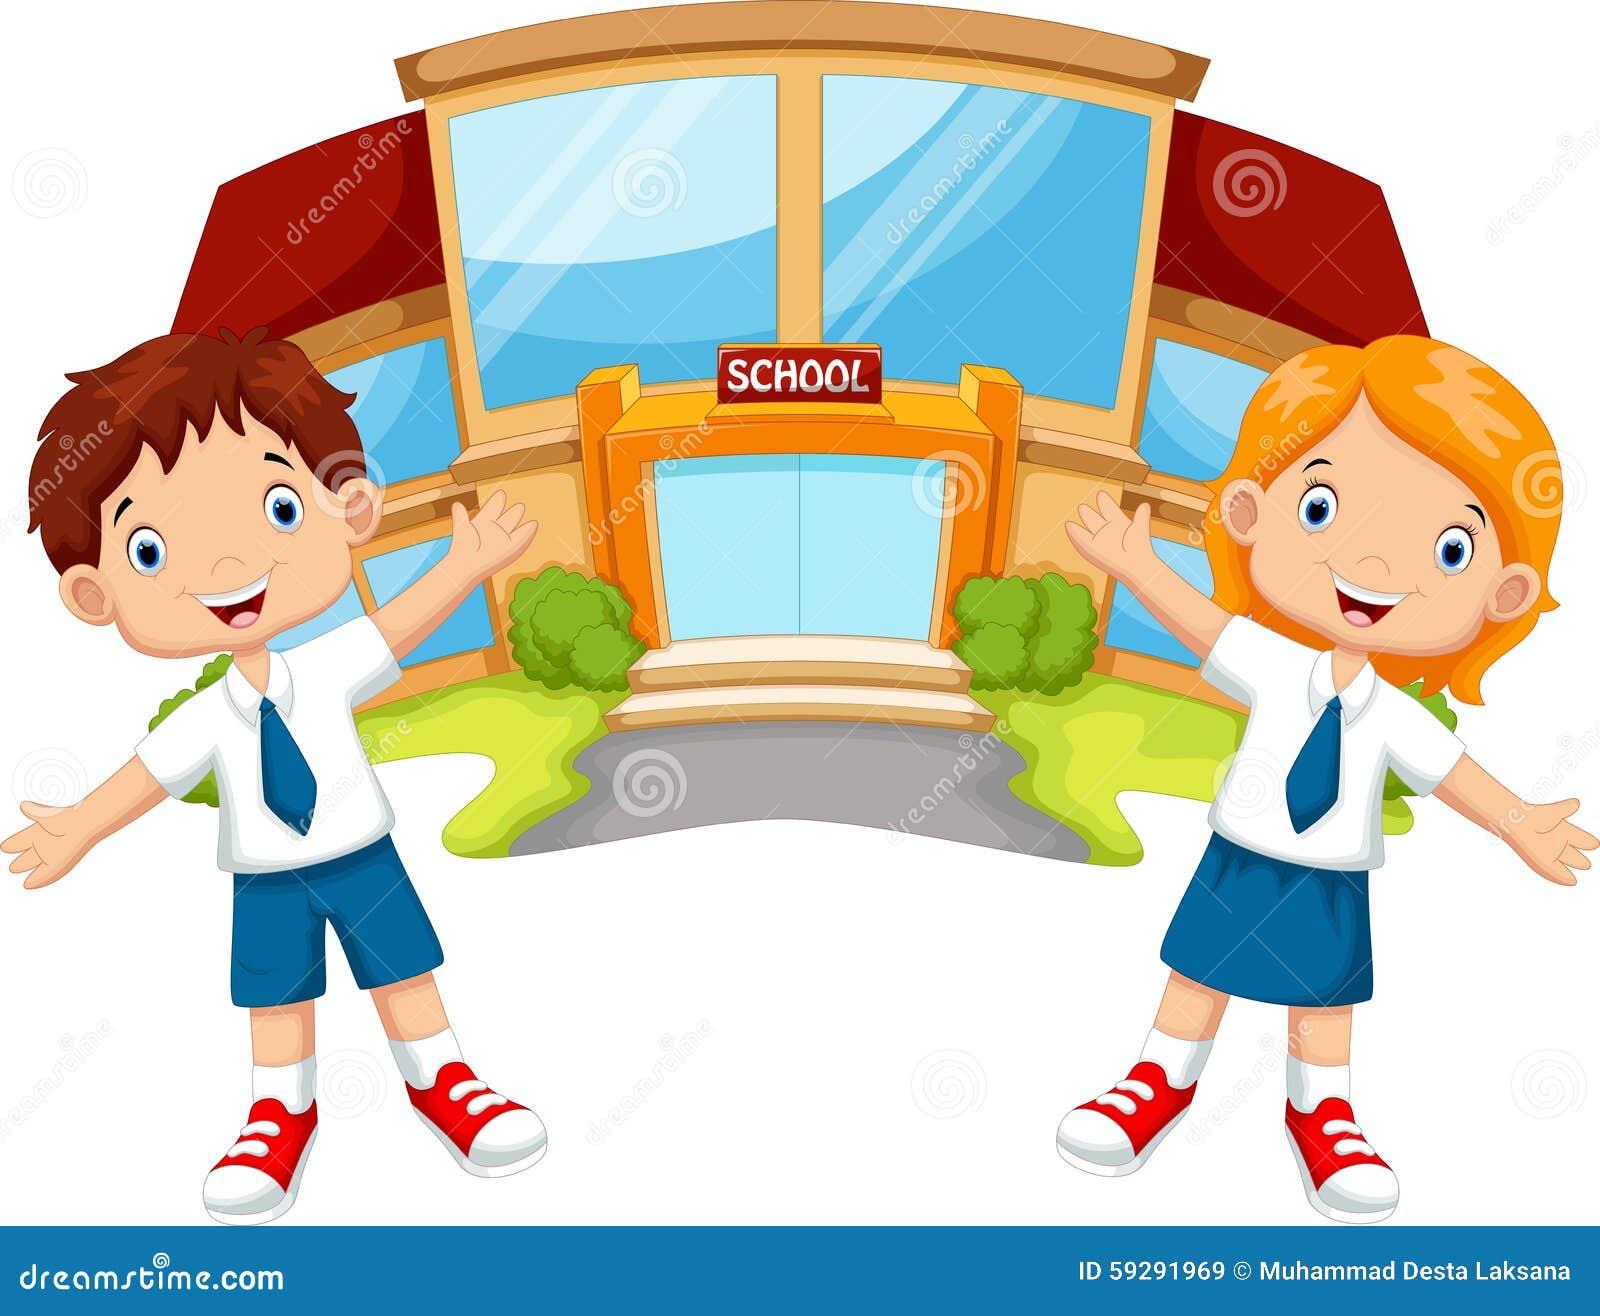 Elementary Classroom Themes ~ School children cartoon stock illustration image